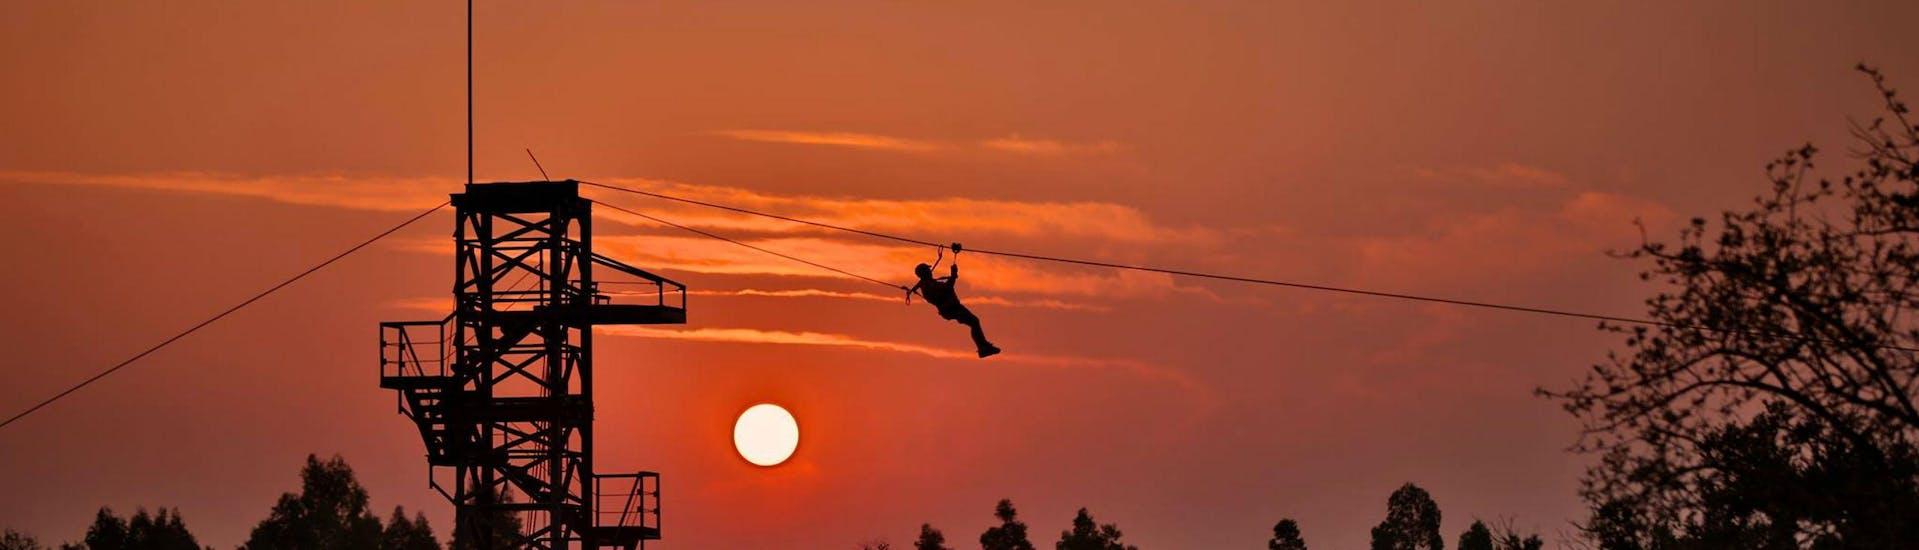 Ziplining near Pretoria in Cullinan